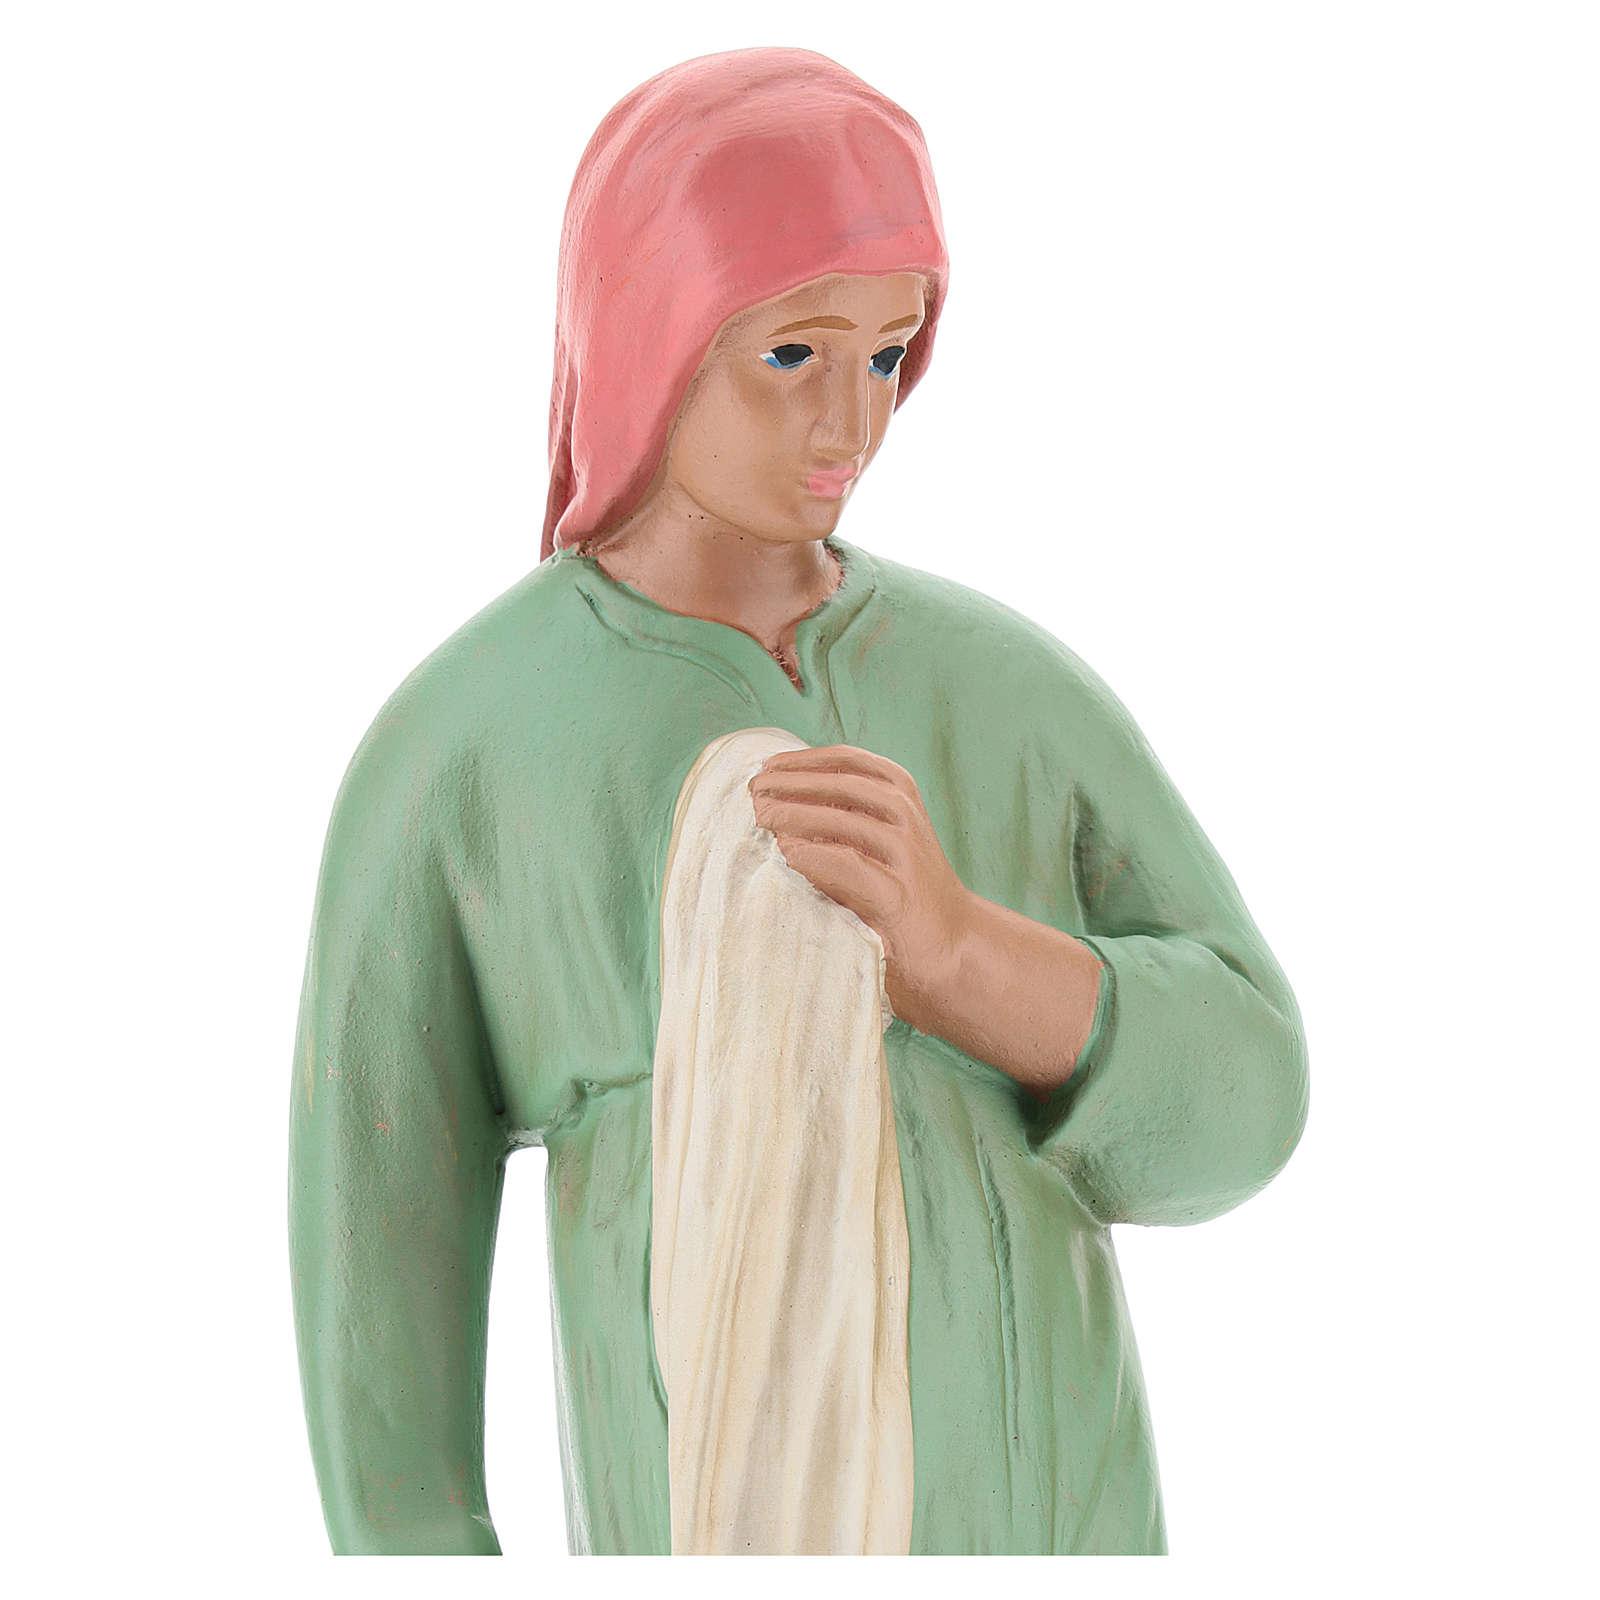 Lavandera con ropa yeso para belenes 20 cm Arte Barsanti 4